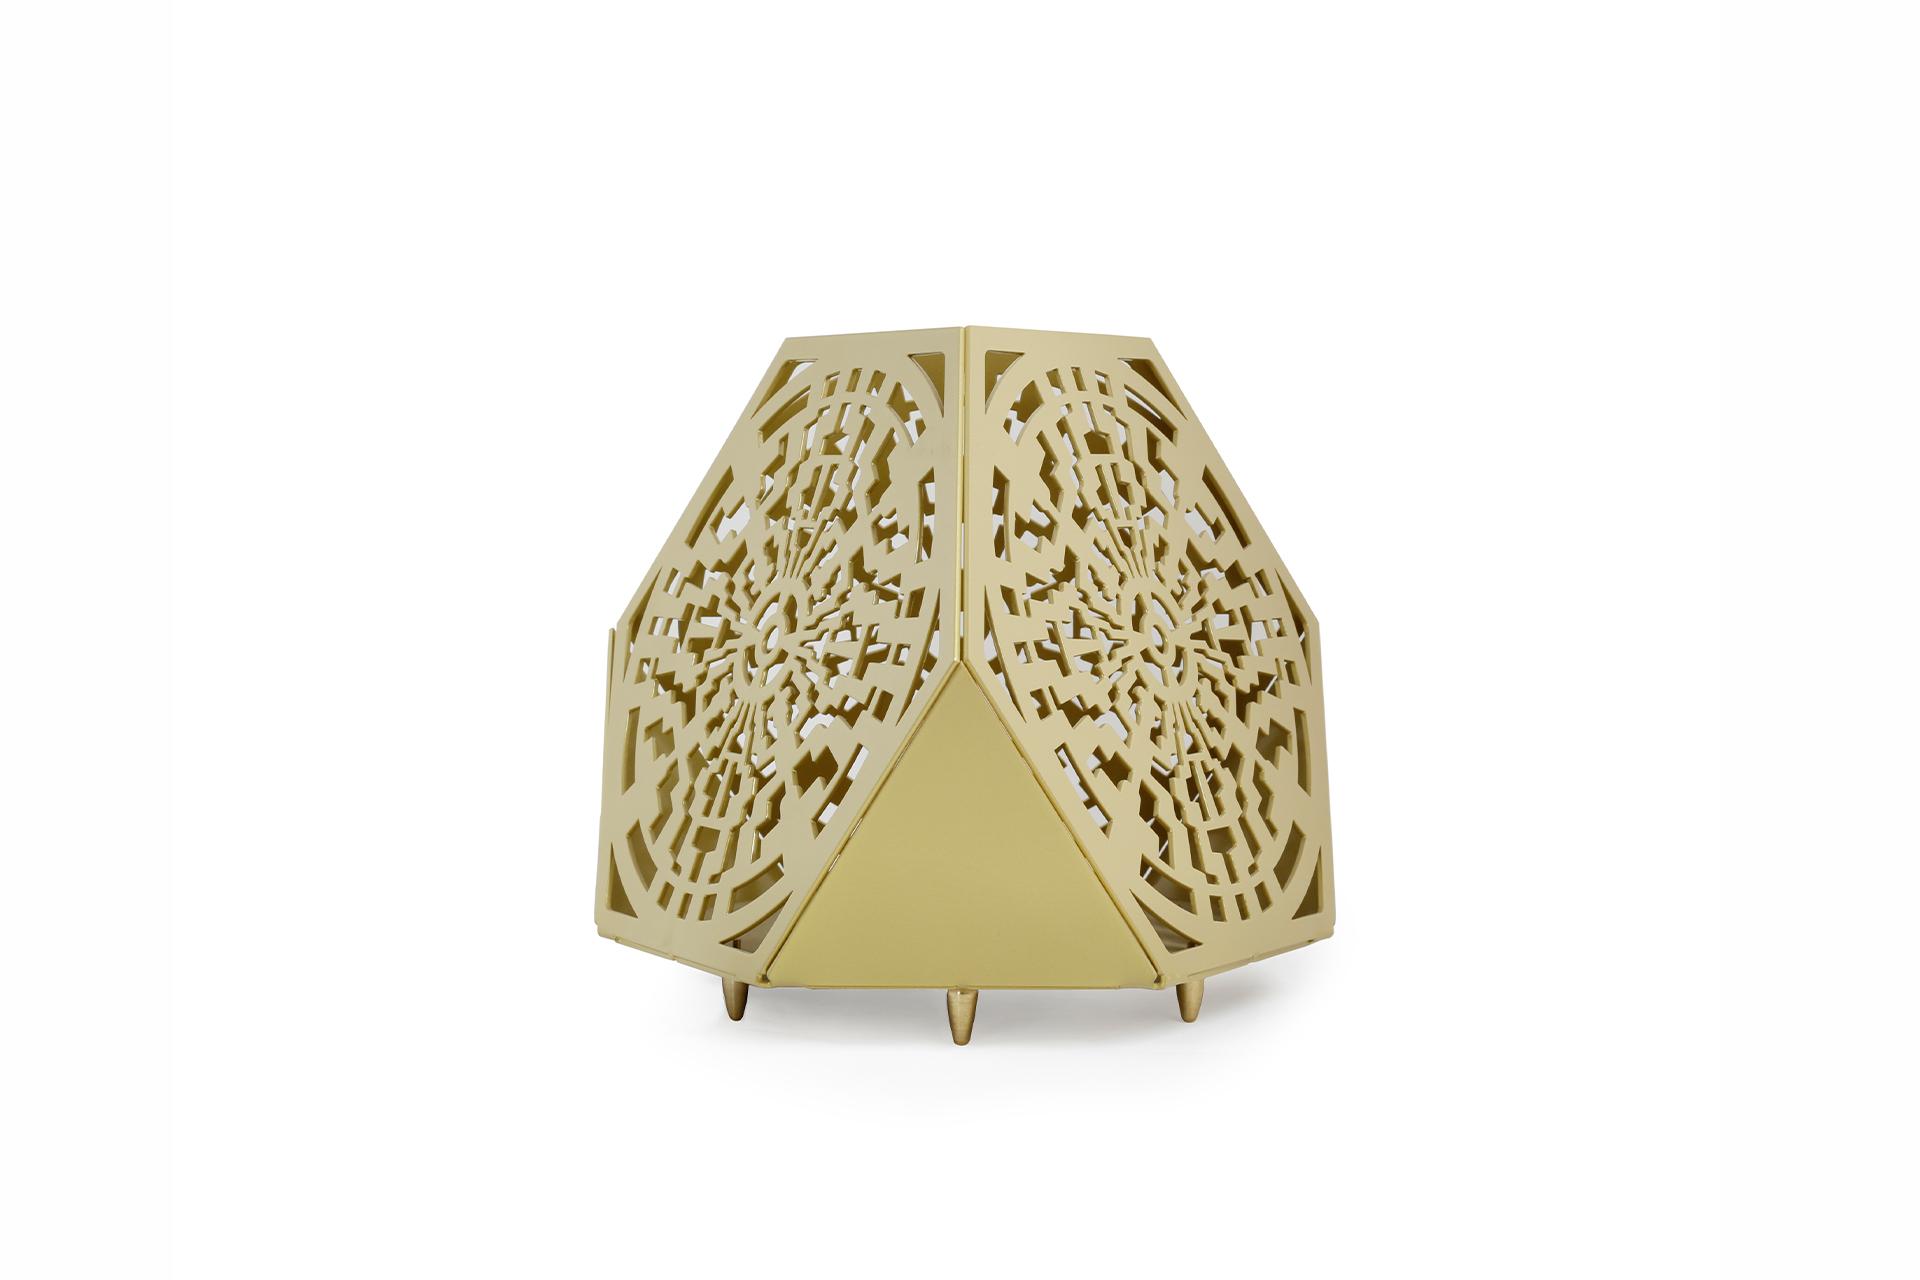 Sacrea Produkt-Bild: tischleuchte-tera-maya-gold-1